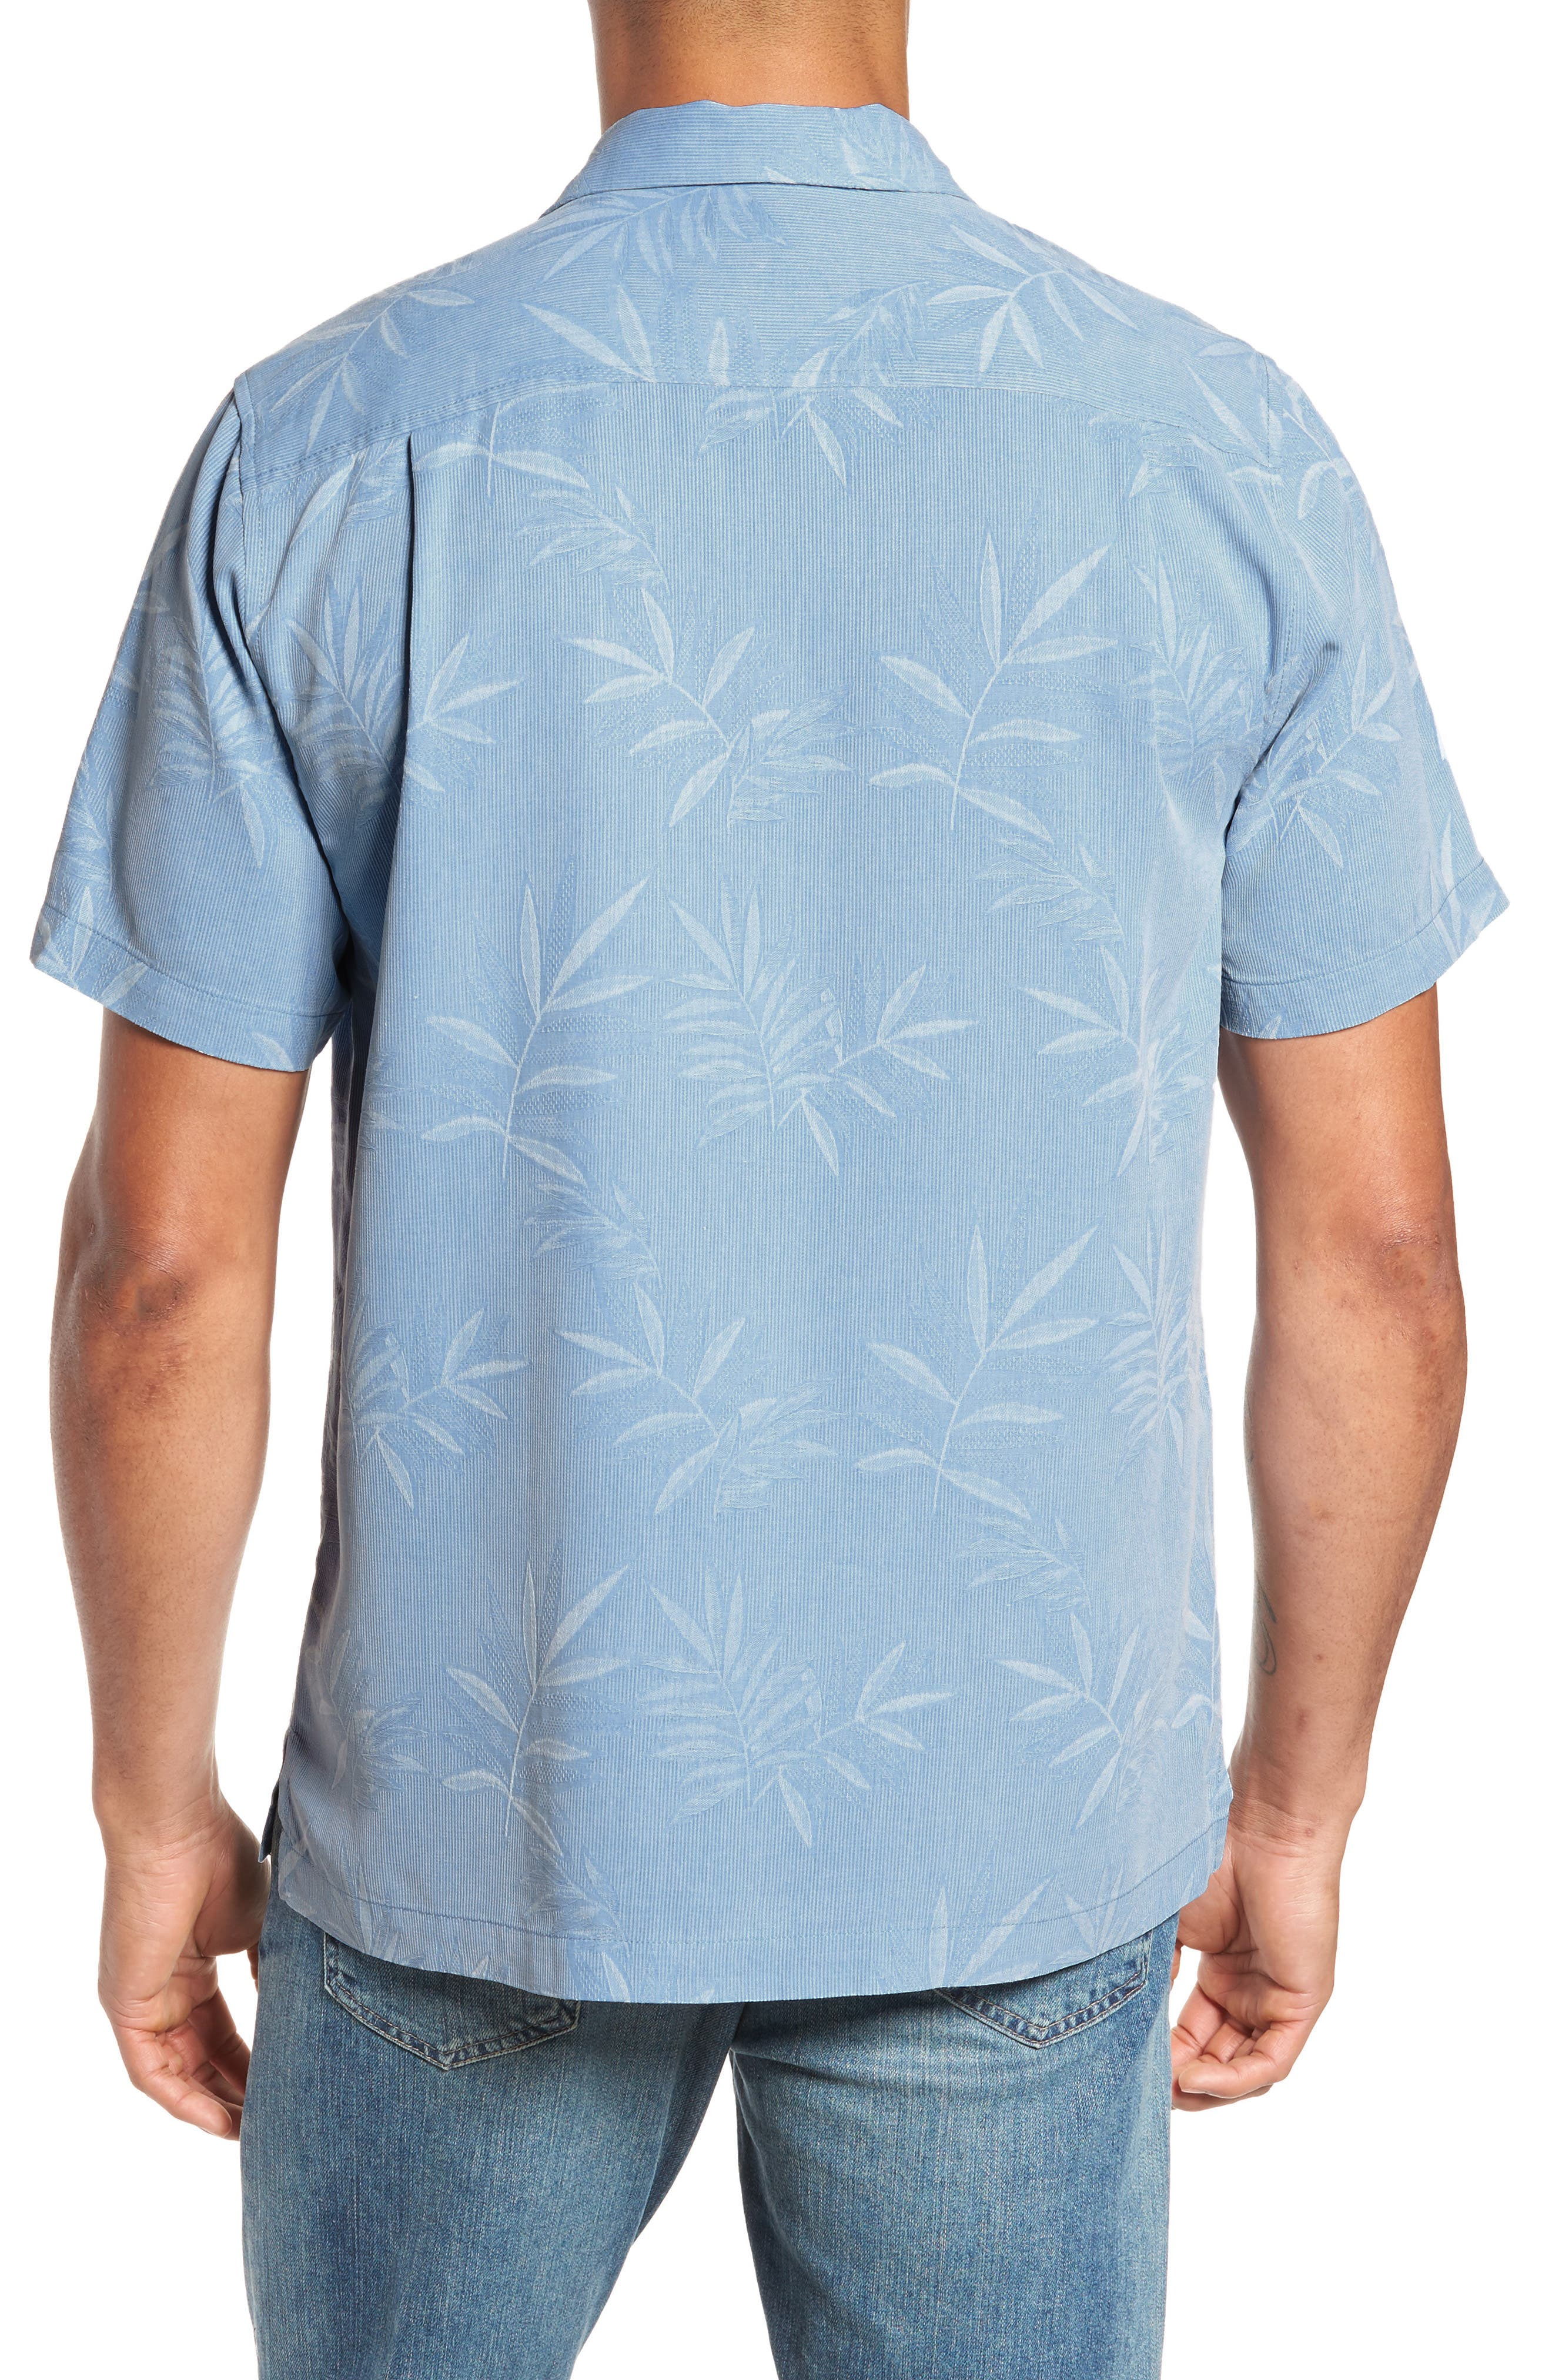 TOMMY BAHAMA,                             Luau Floral Silk Shirt,                             Alternate thumbnail 2, color,                             408